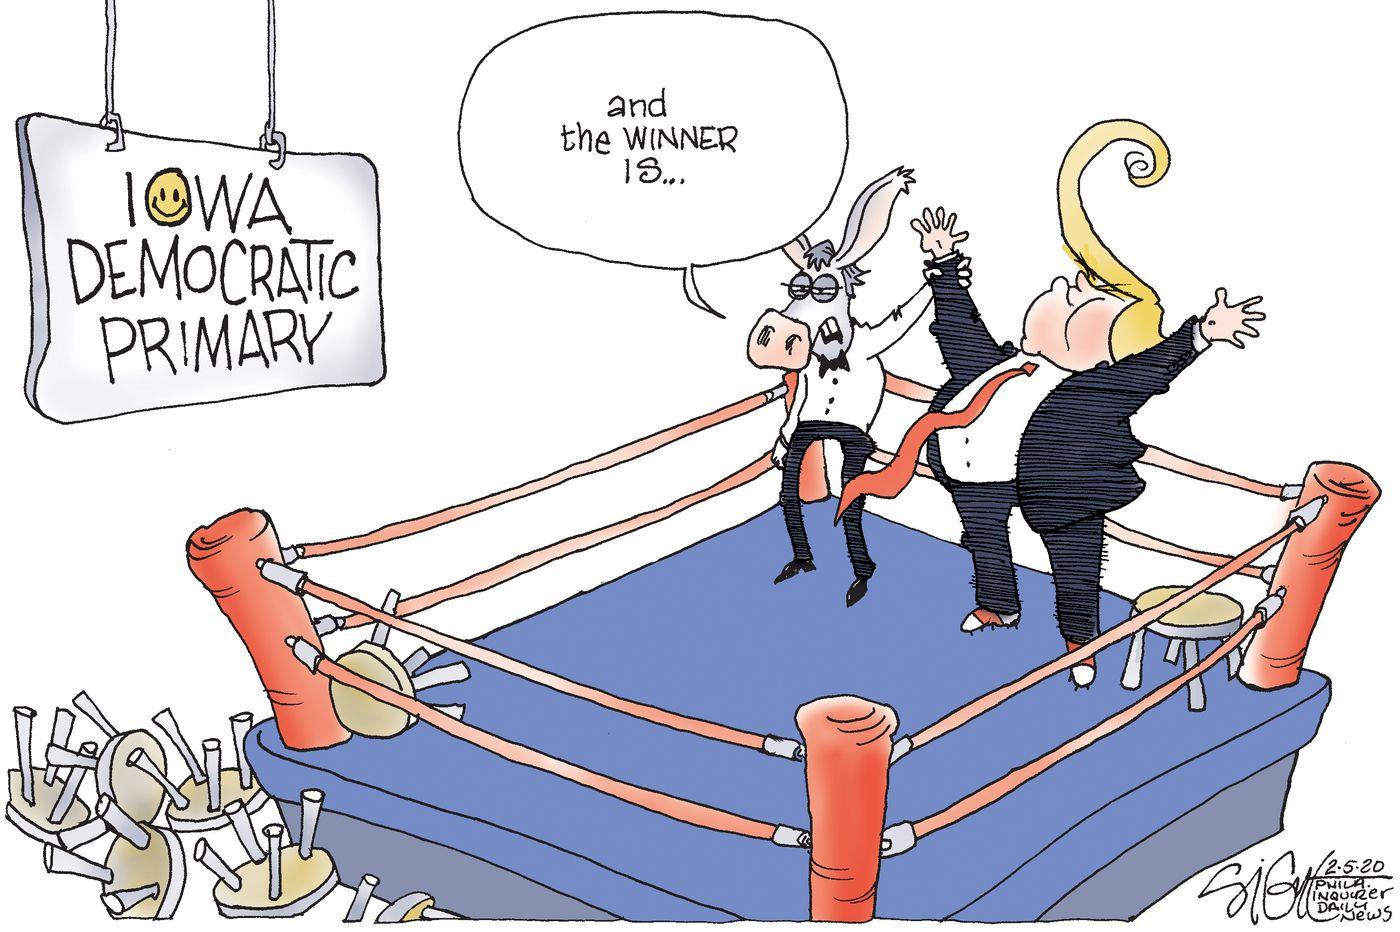 Political Cartoon: Trump wins Iowa caucuses